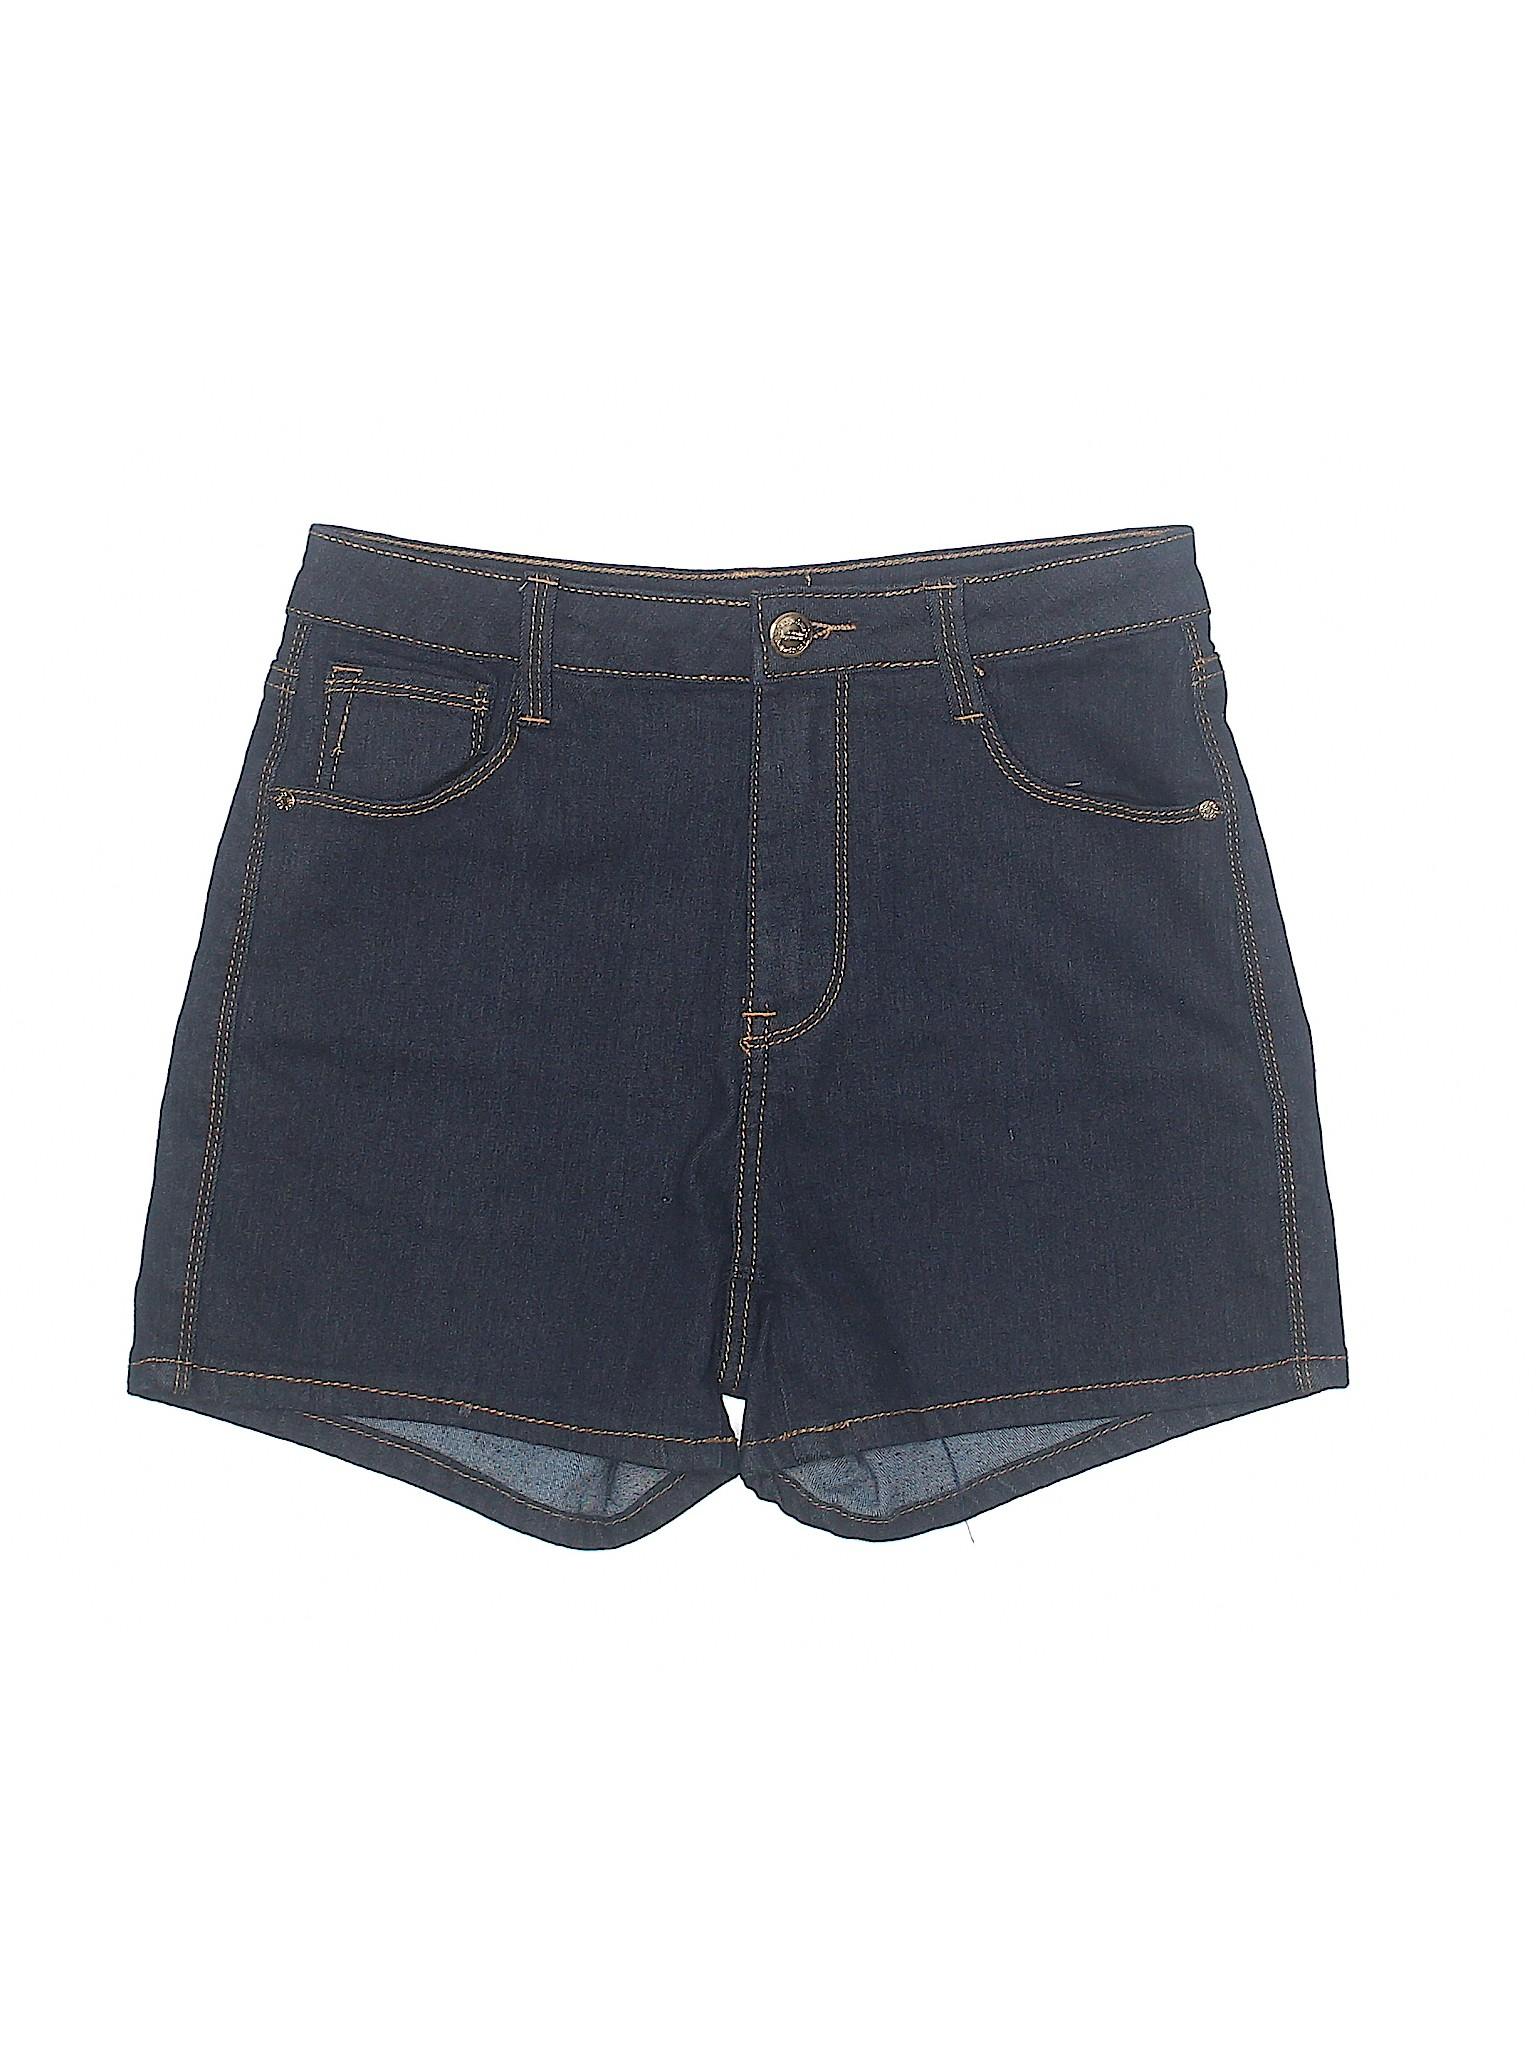 Shorts Boutique Papaya Papaya Boutique Denim qF6XT